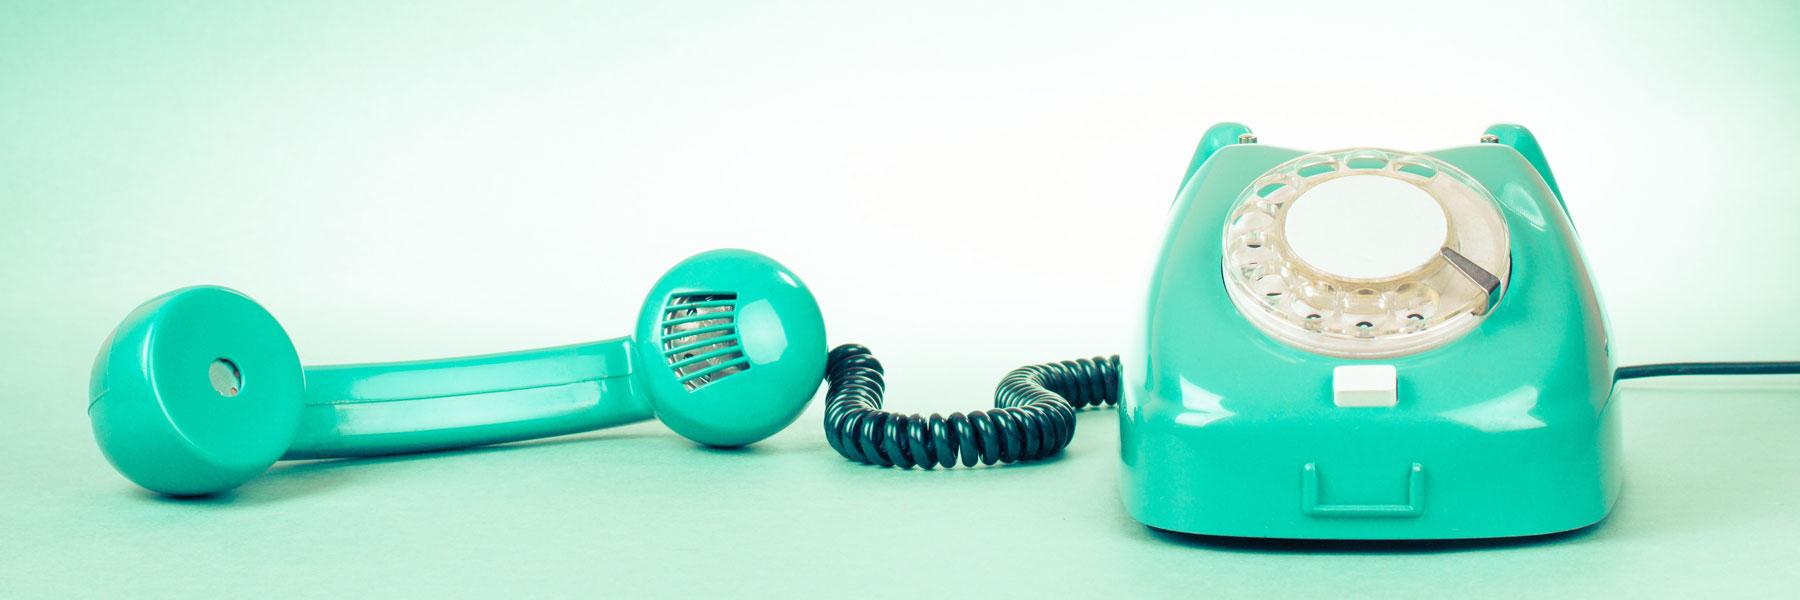 turquoise phone.